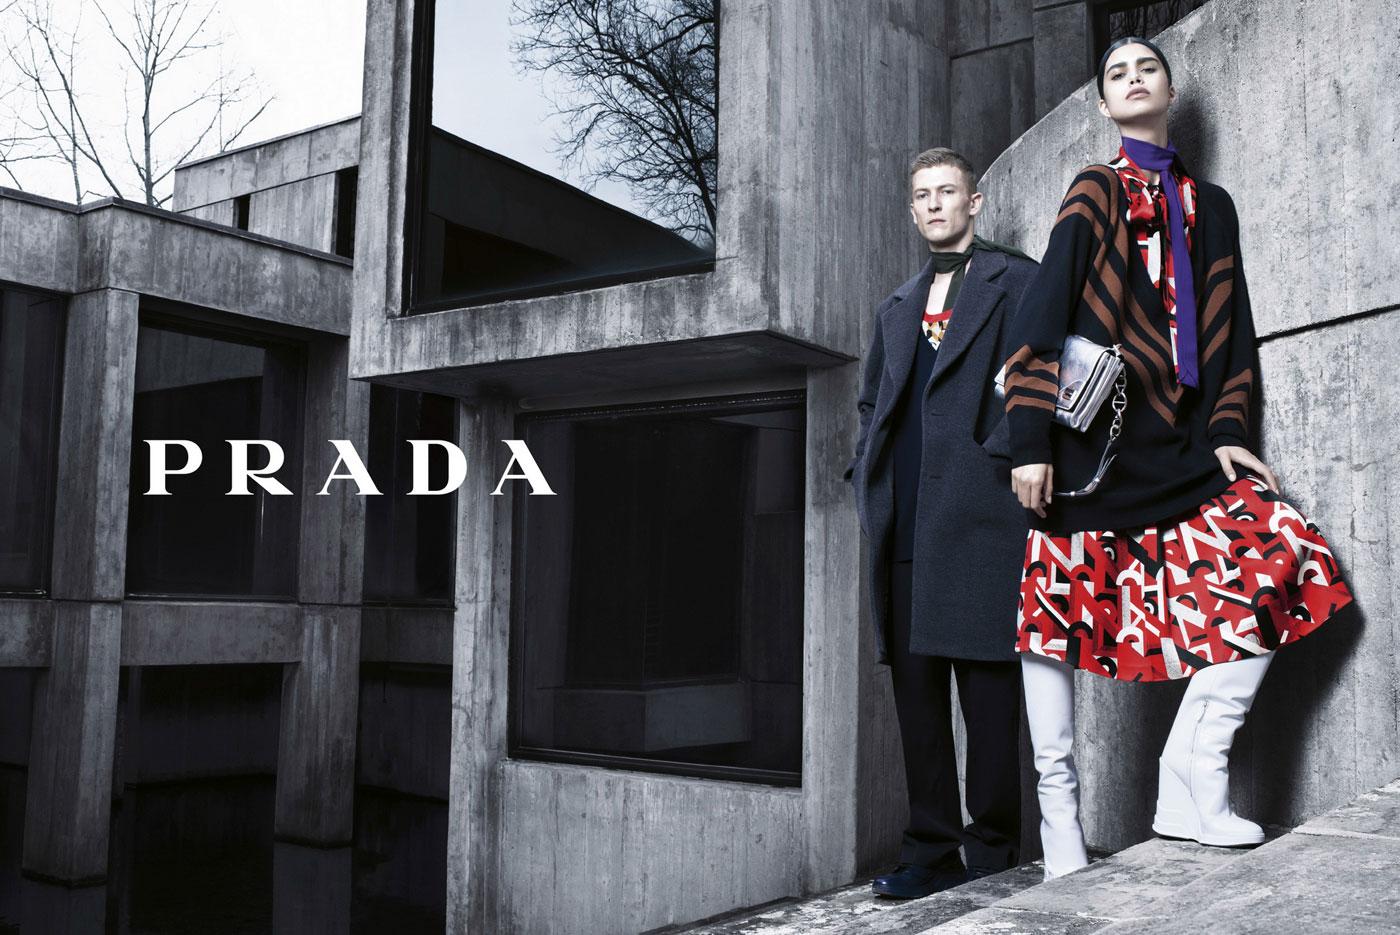 Prada Fall Winter 2014 Campaign by Steven Meisel